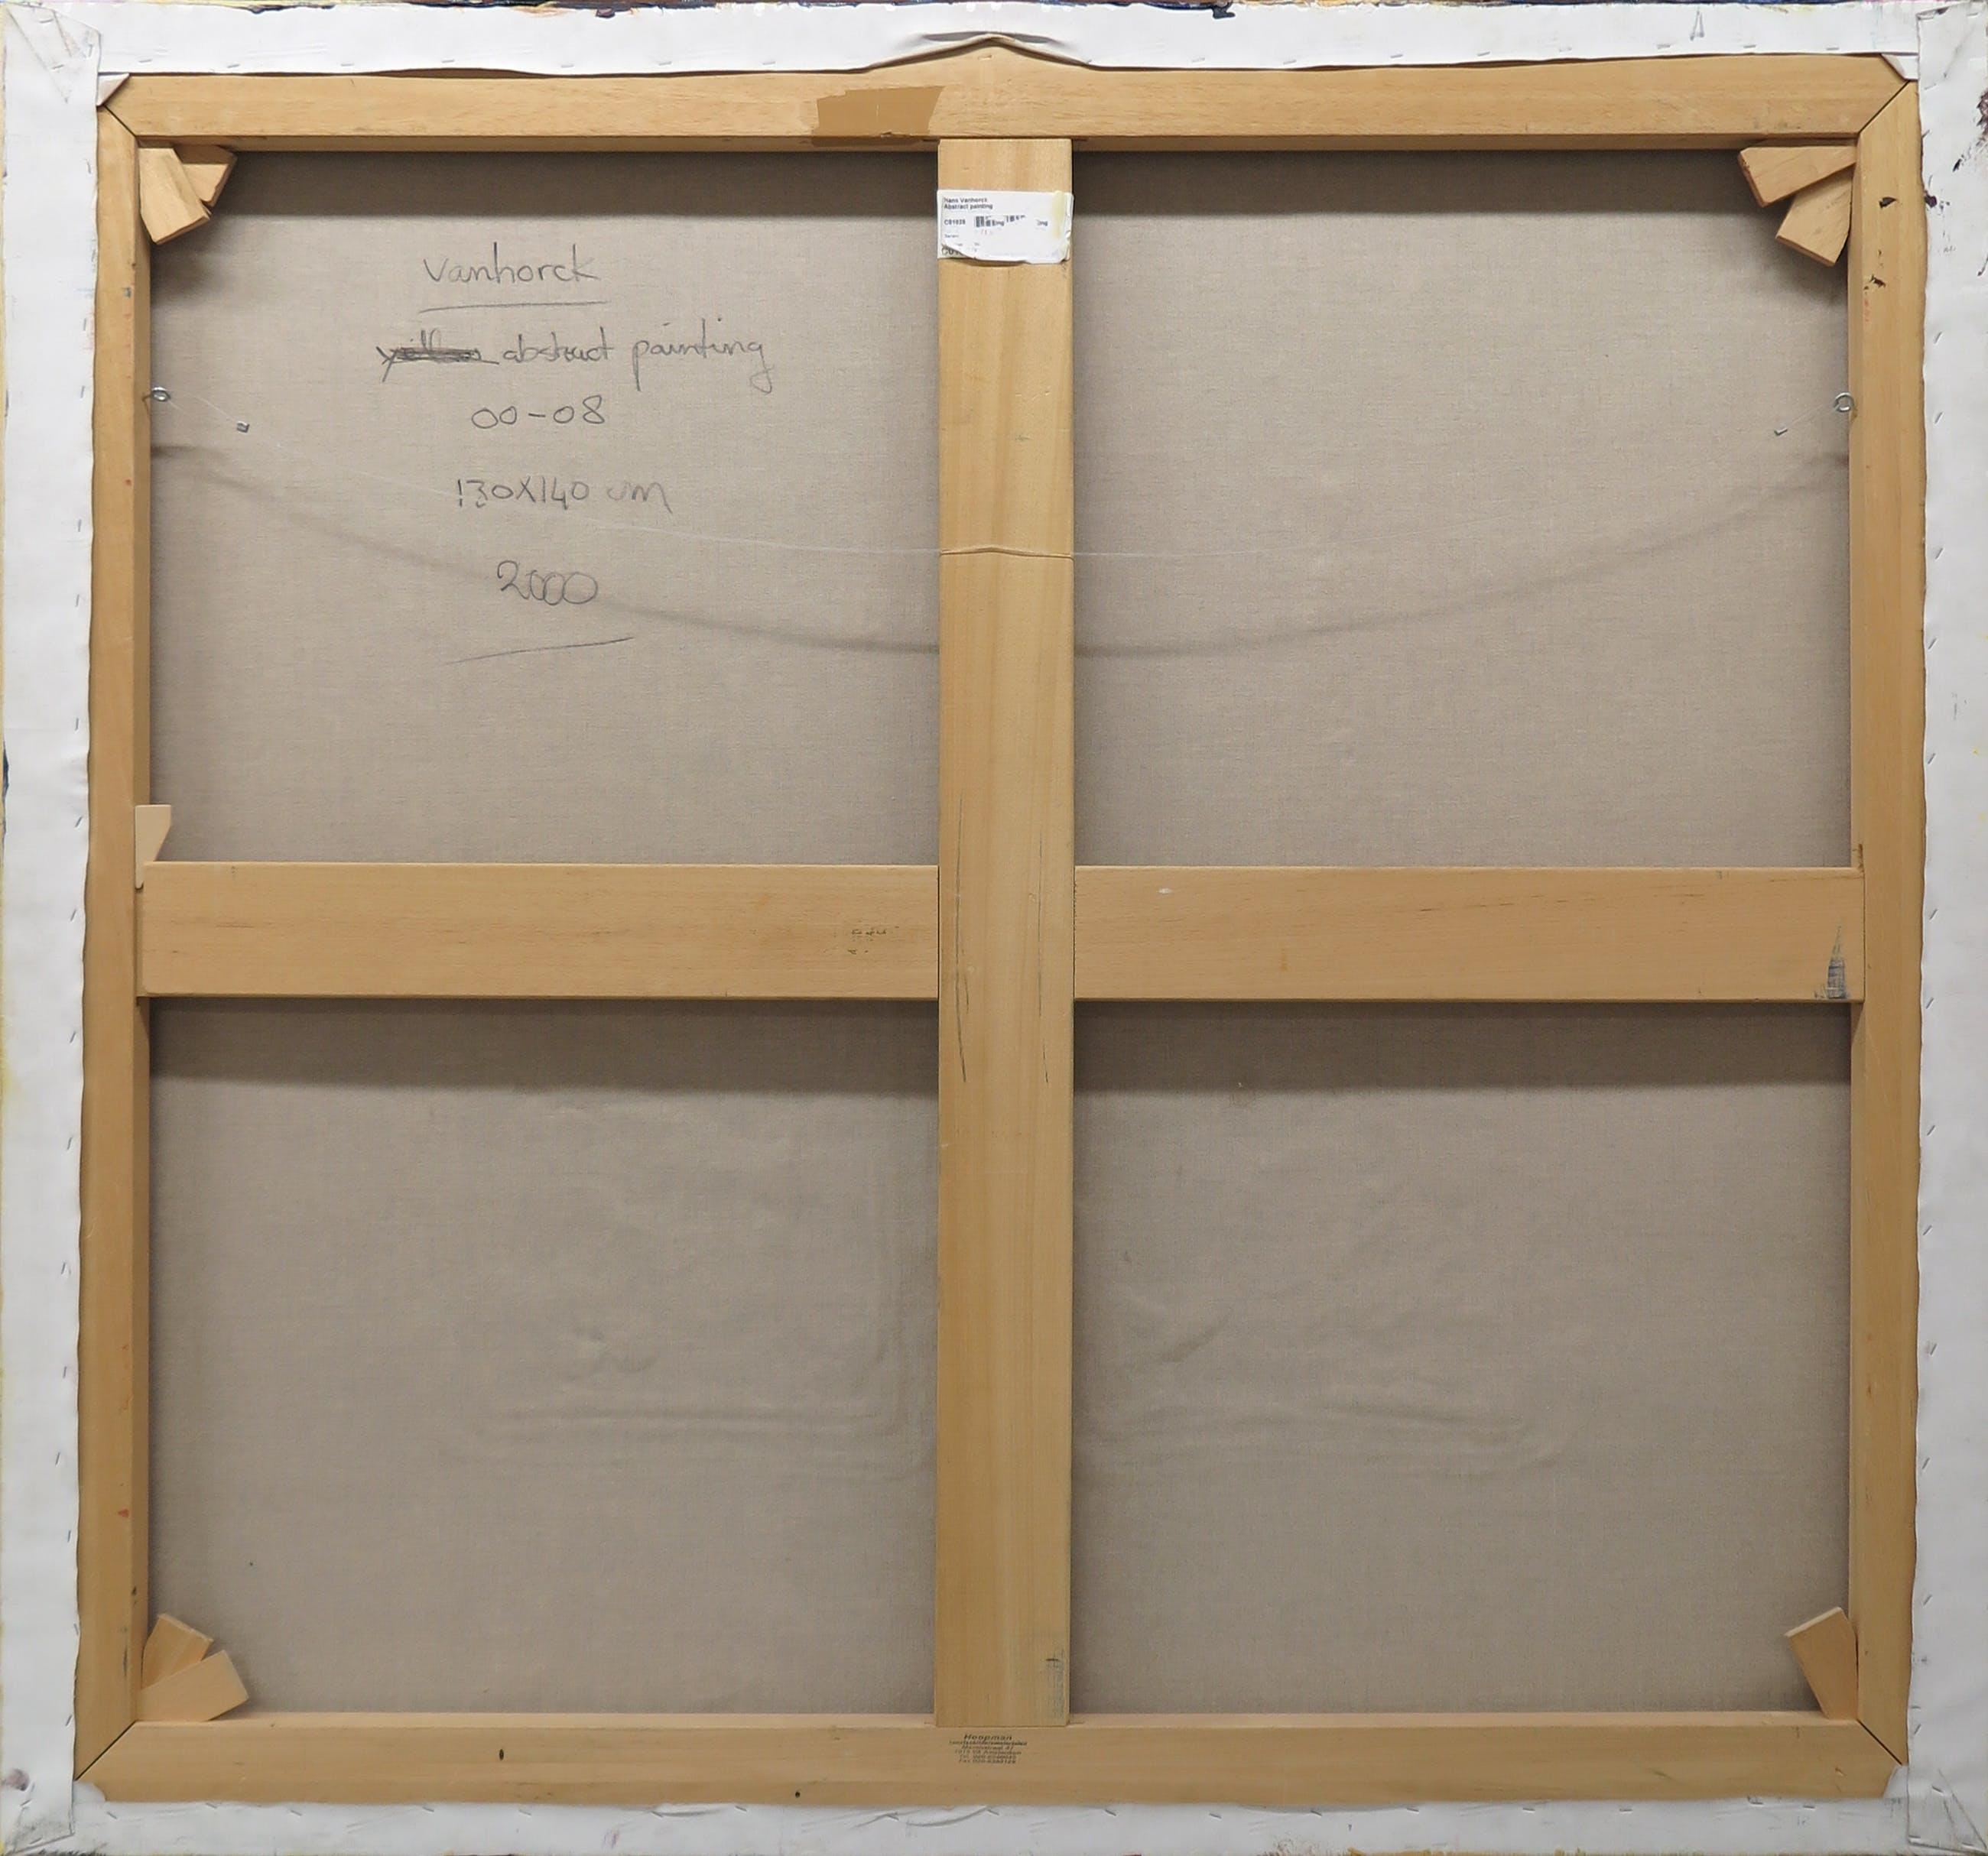 Hans Vanhorck - Olieverf op doek, Abstract painting (Zeer groot) kopen? Bied vanaf 600!